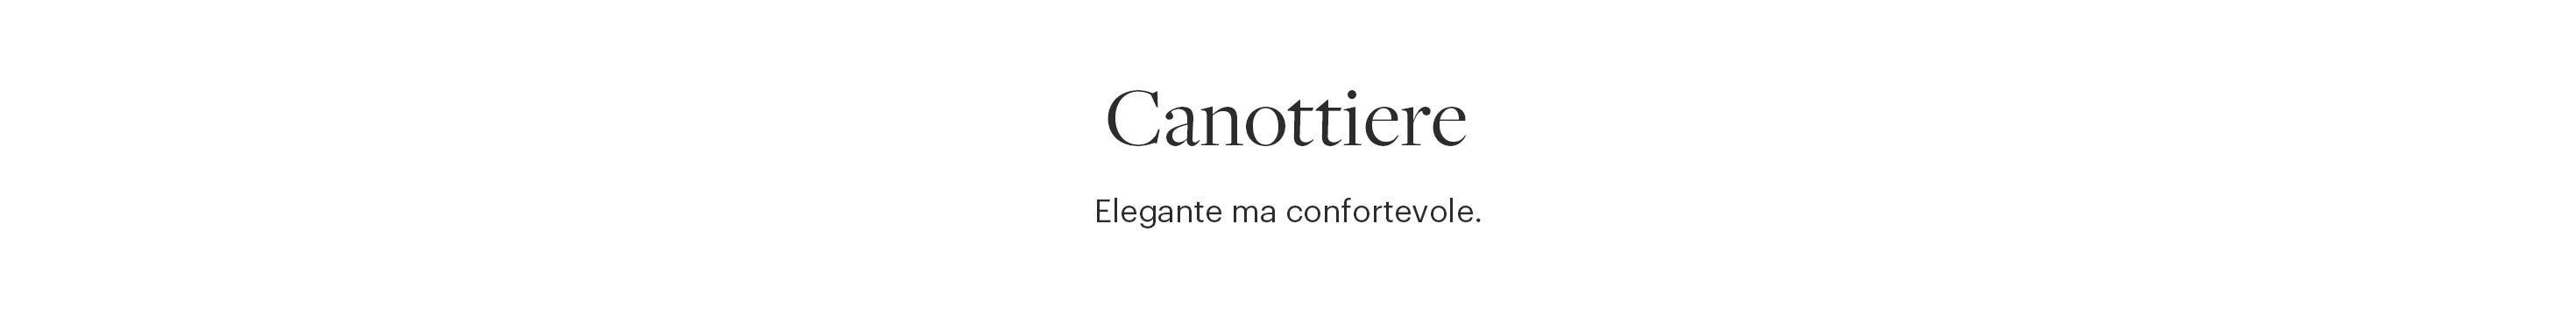 Canottiere